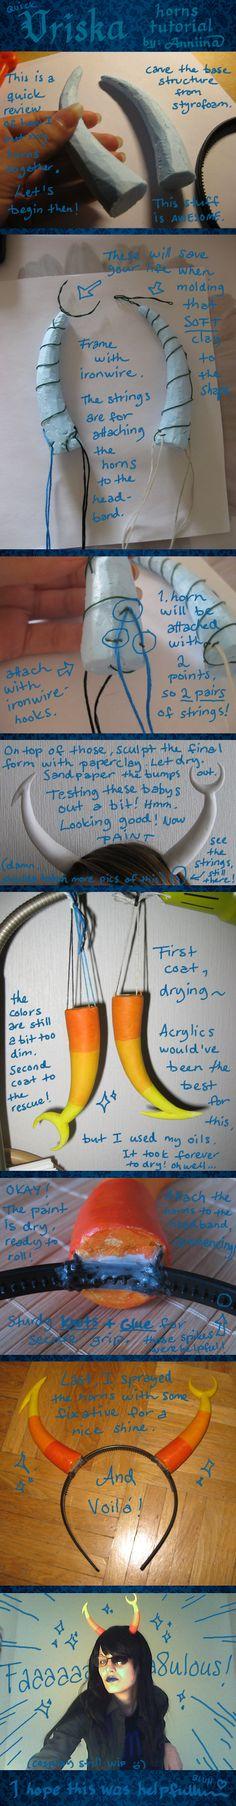 Vriska horns tutorial @Ashley Walters Johnson I figured you could use something like this!